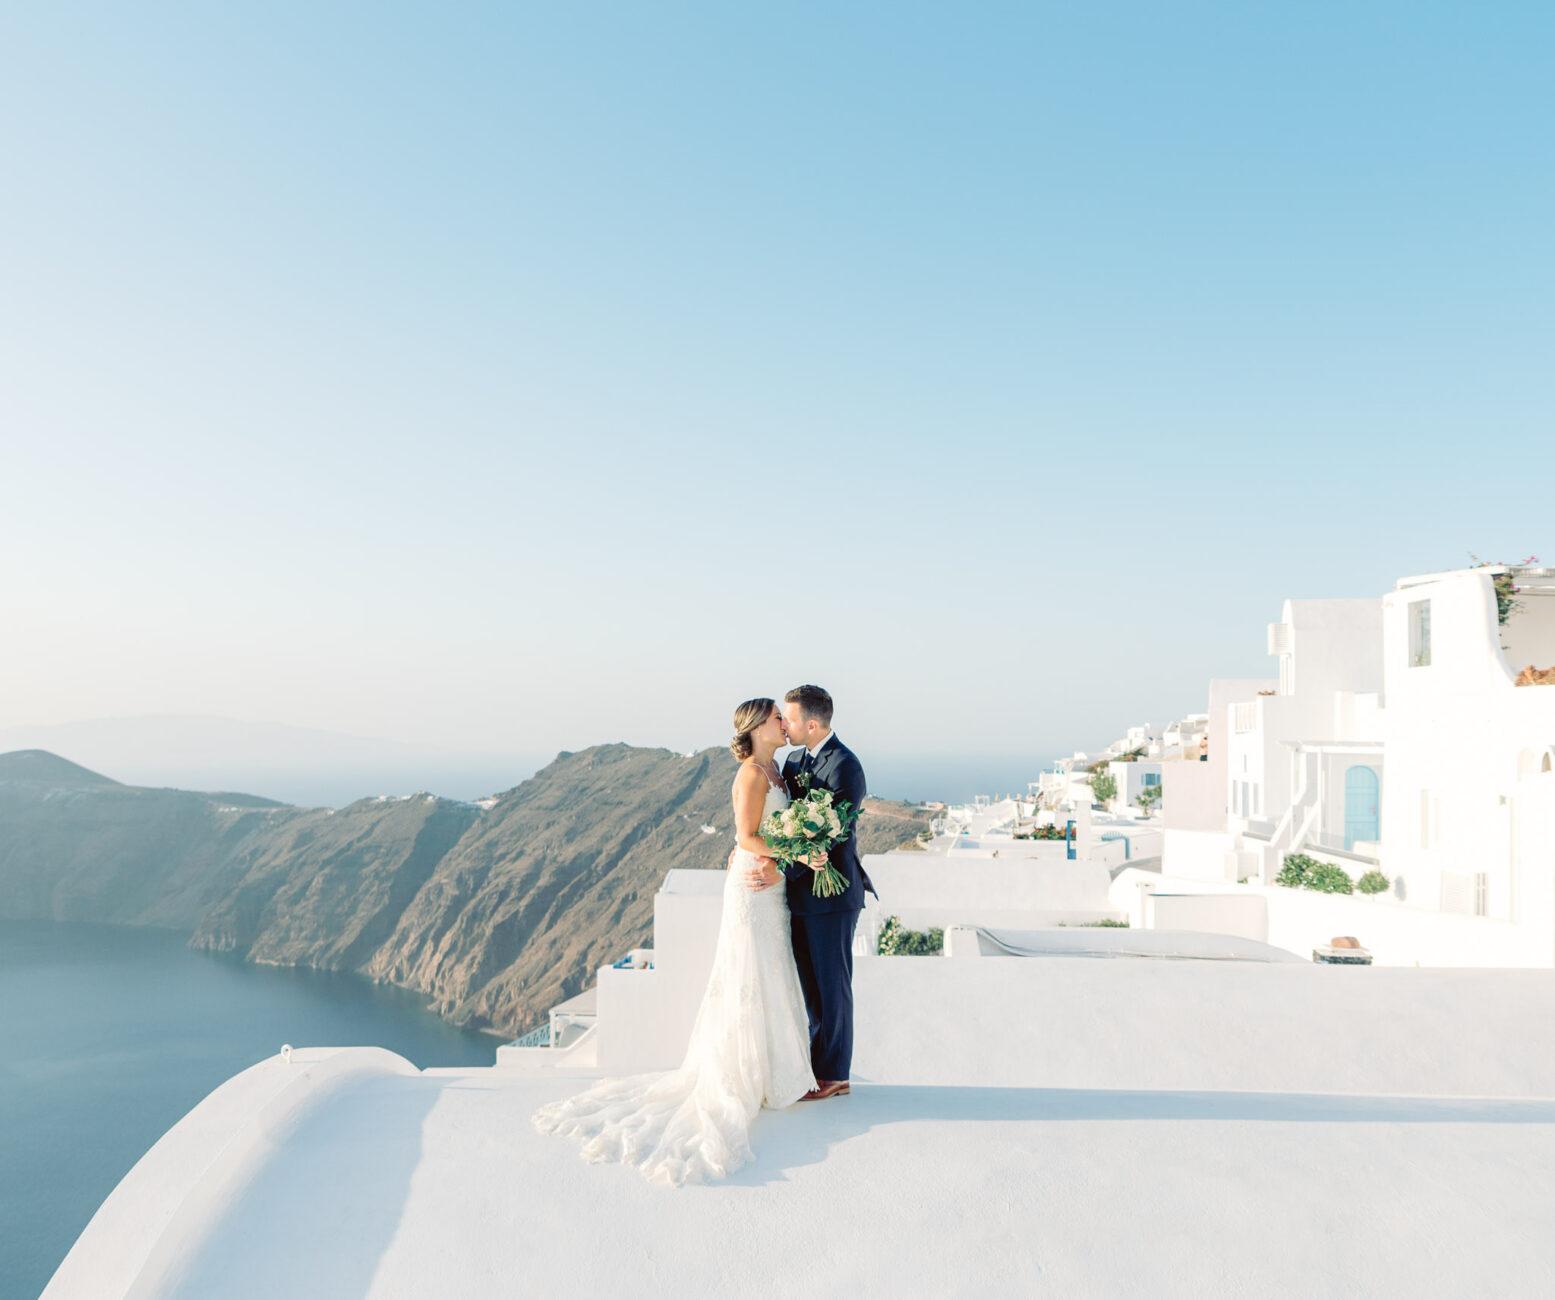 Dimitris - Psillakis - Photographer - Santorini - Crete - Mykonos photographer - Wedding - Elopement - Honeymoon - Engagement - Proposal Greek photographer- in Santorini and Crete